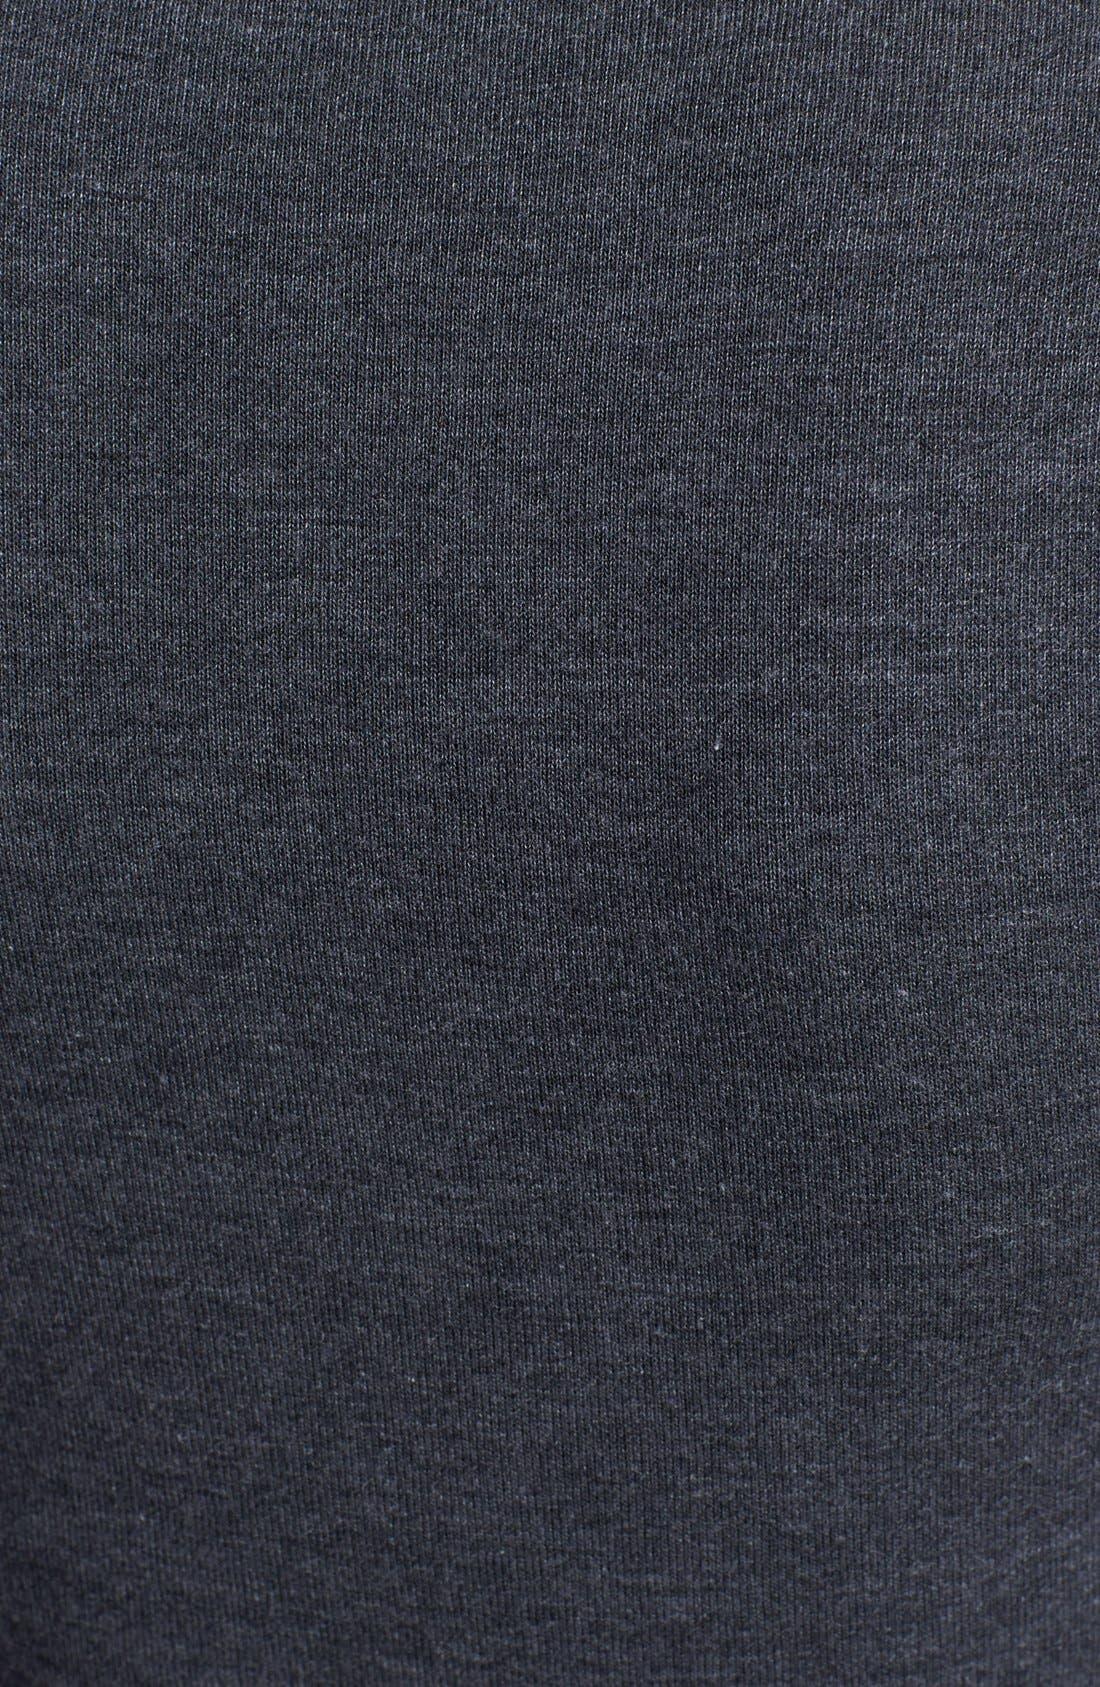 Alternate Image 3  - Three Dots Fit & Flare Sweater Dress